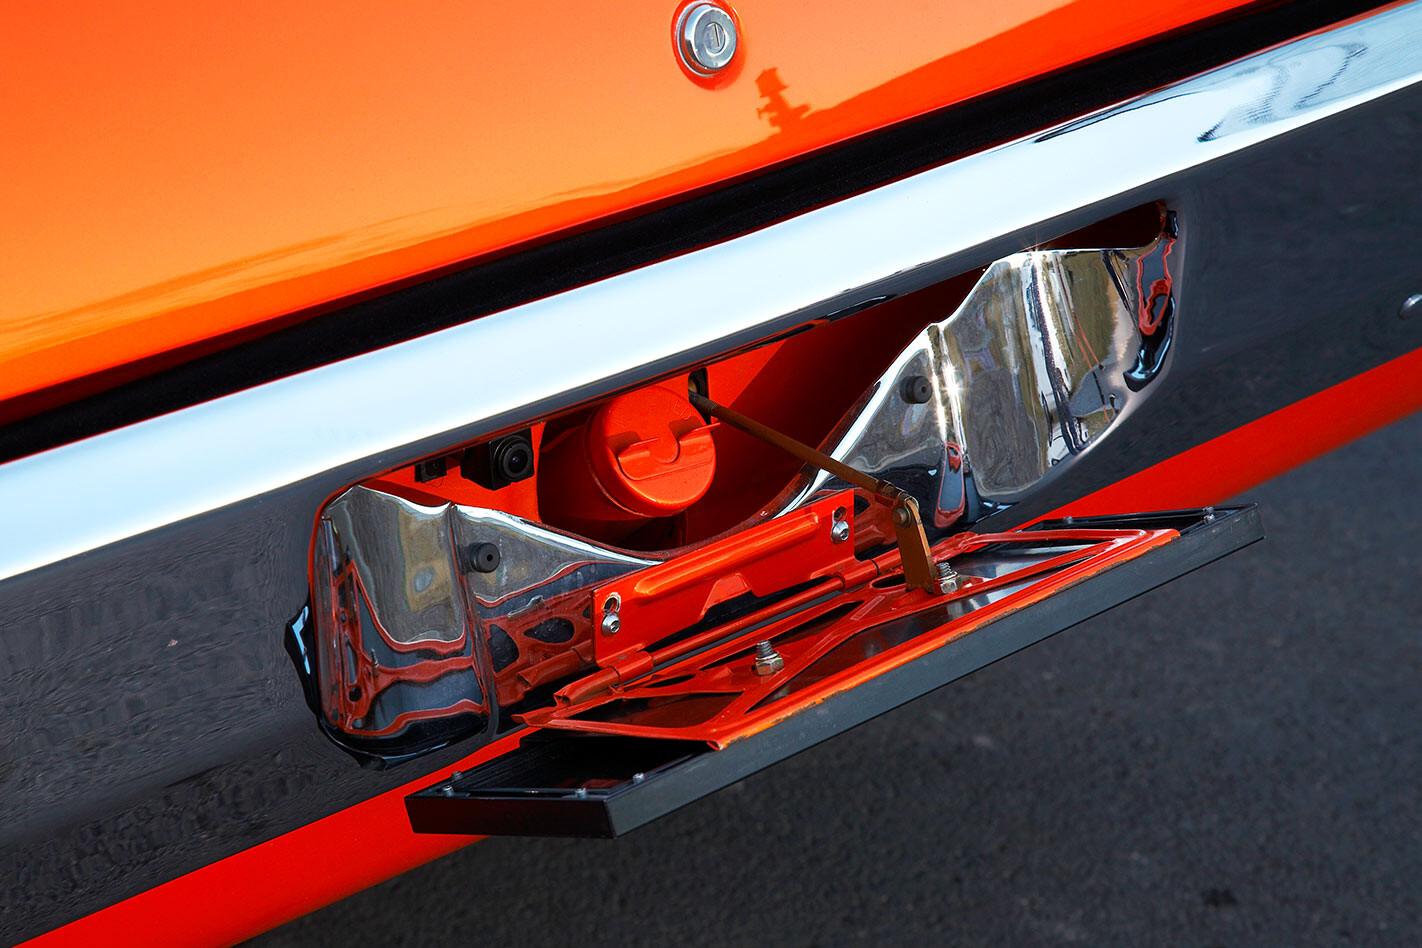 HQ Rear plate